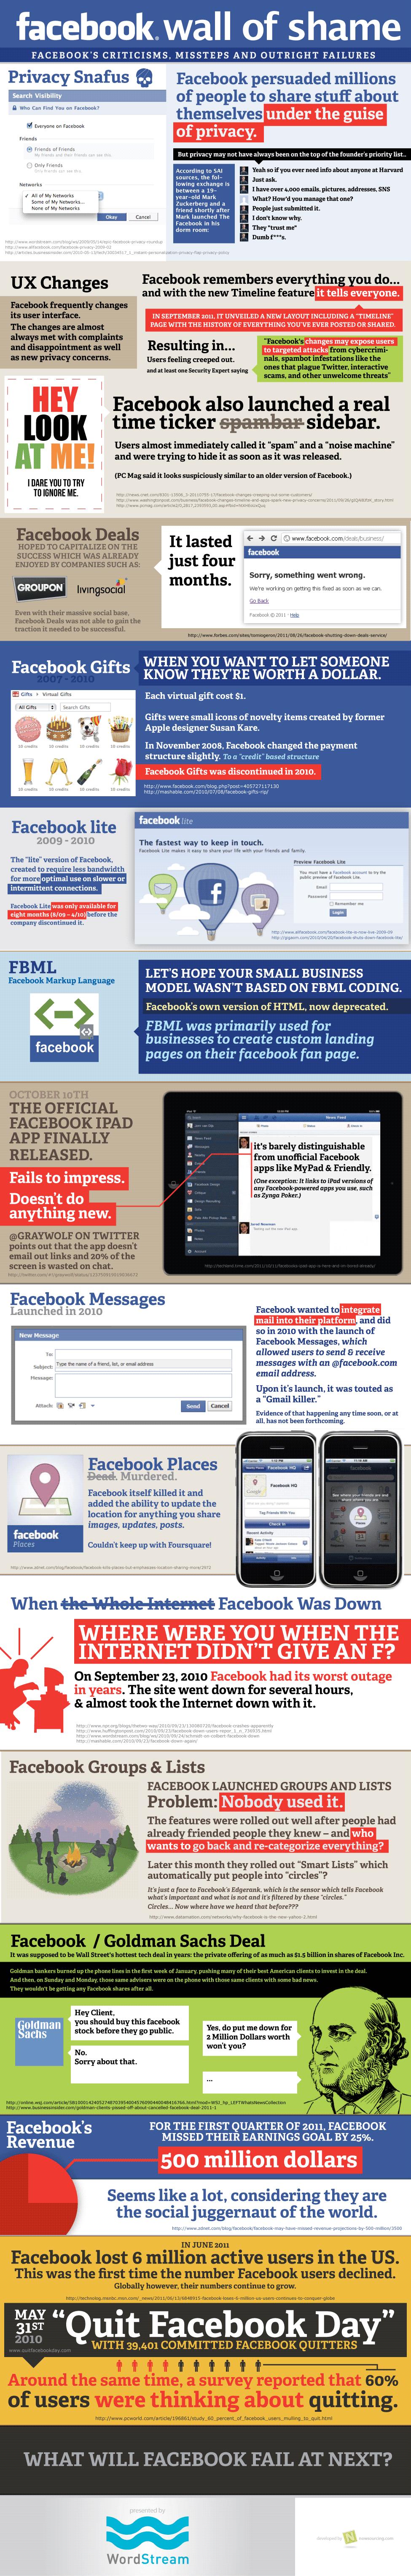 Facebook Wall-of-Shame